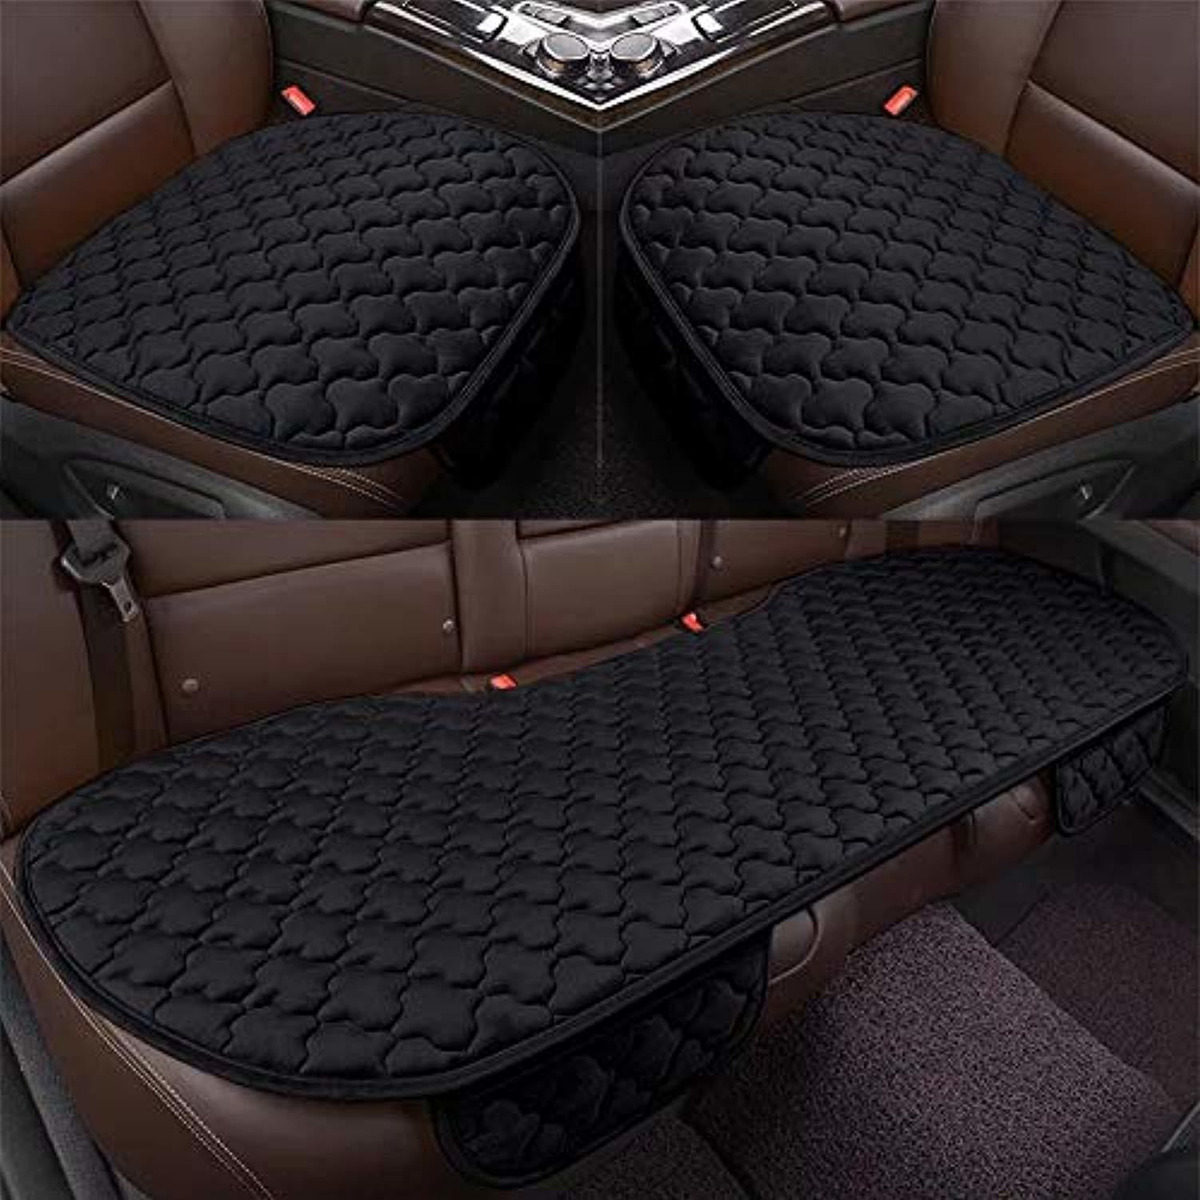 DashMat Original Dashboard Cover Nissan Axxess Premium Carpet, Red 81989-01-25